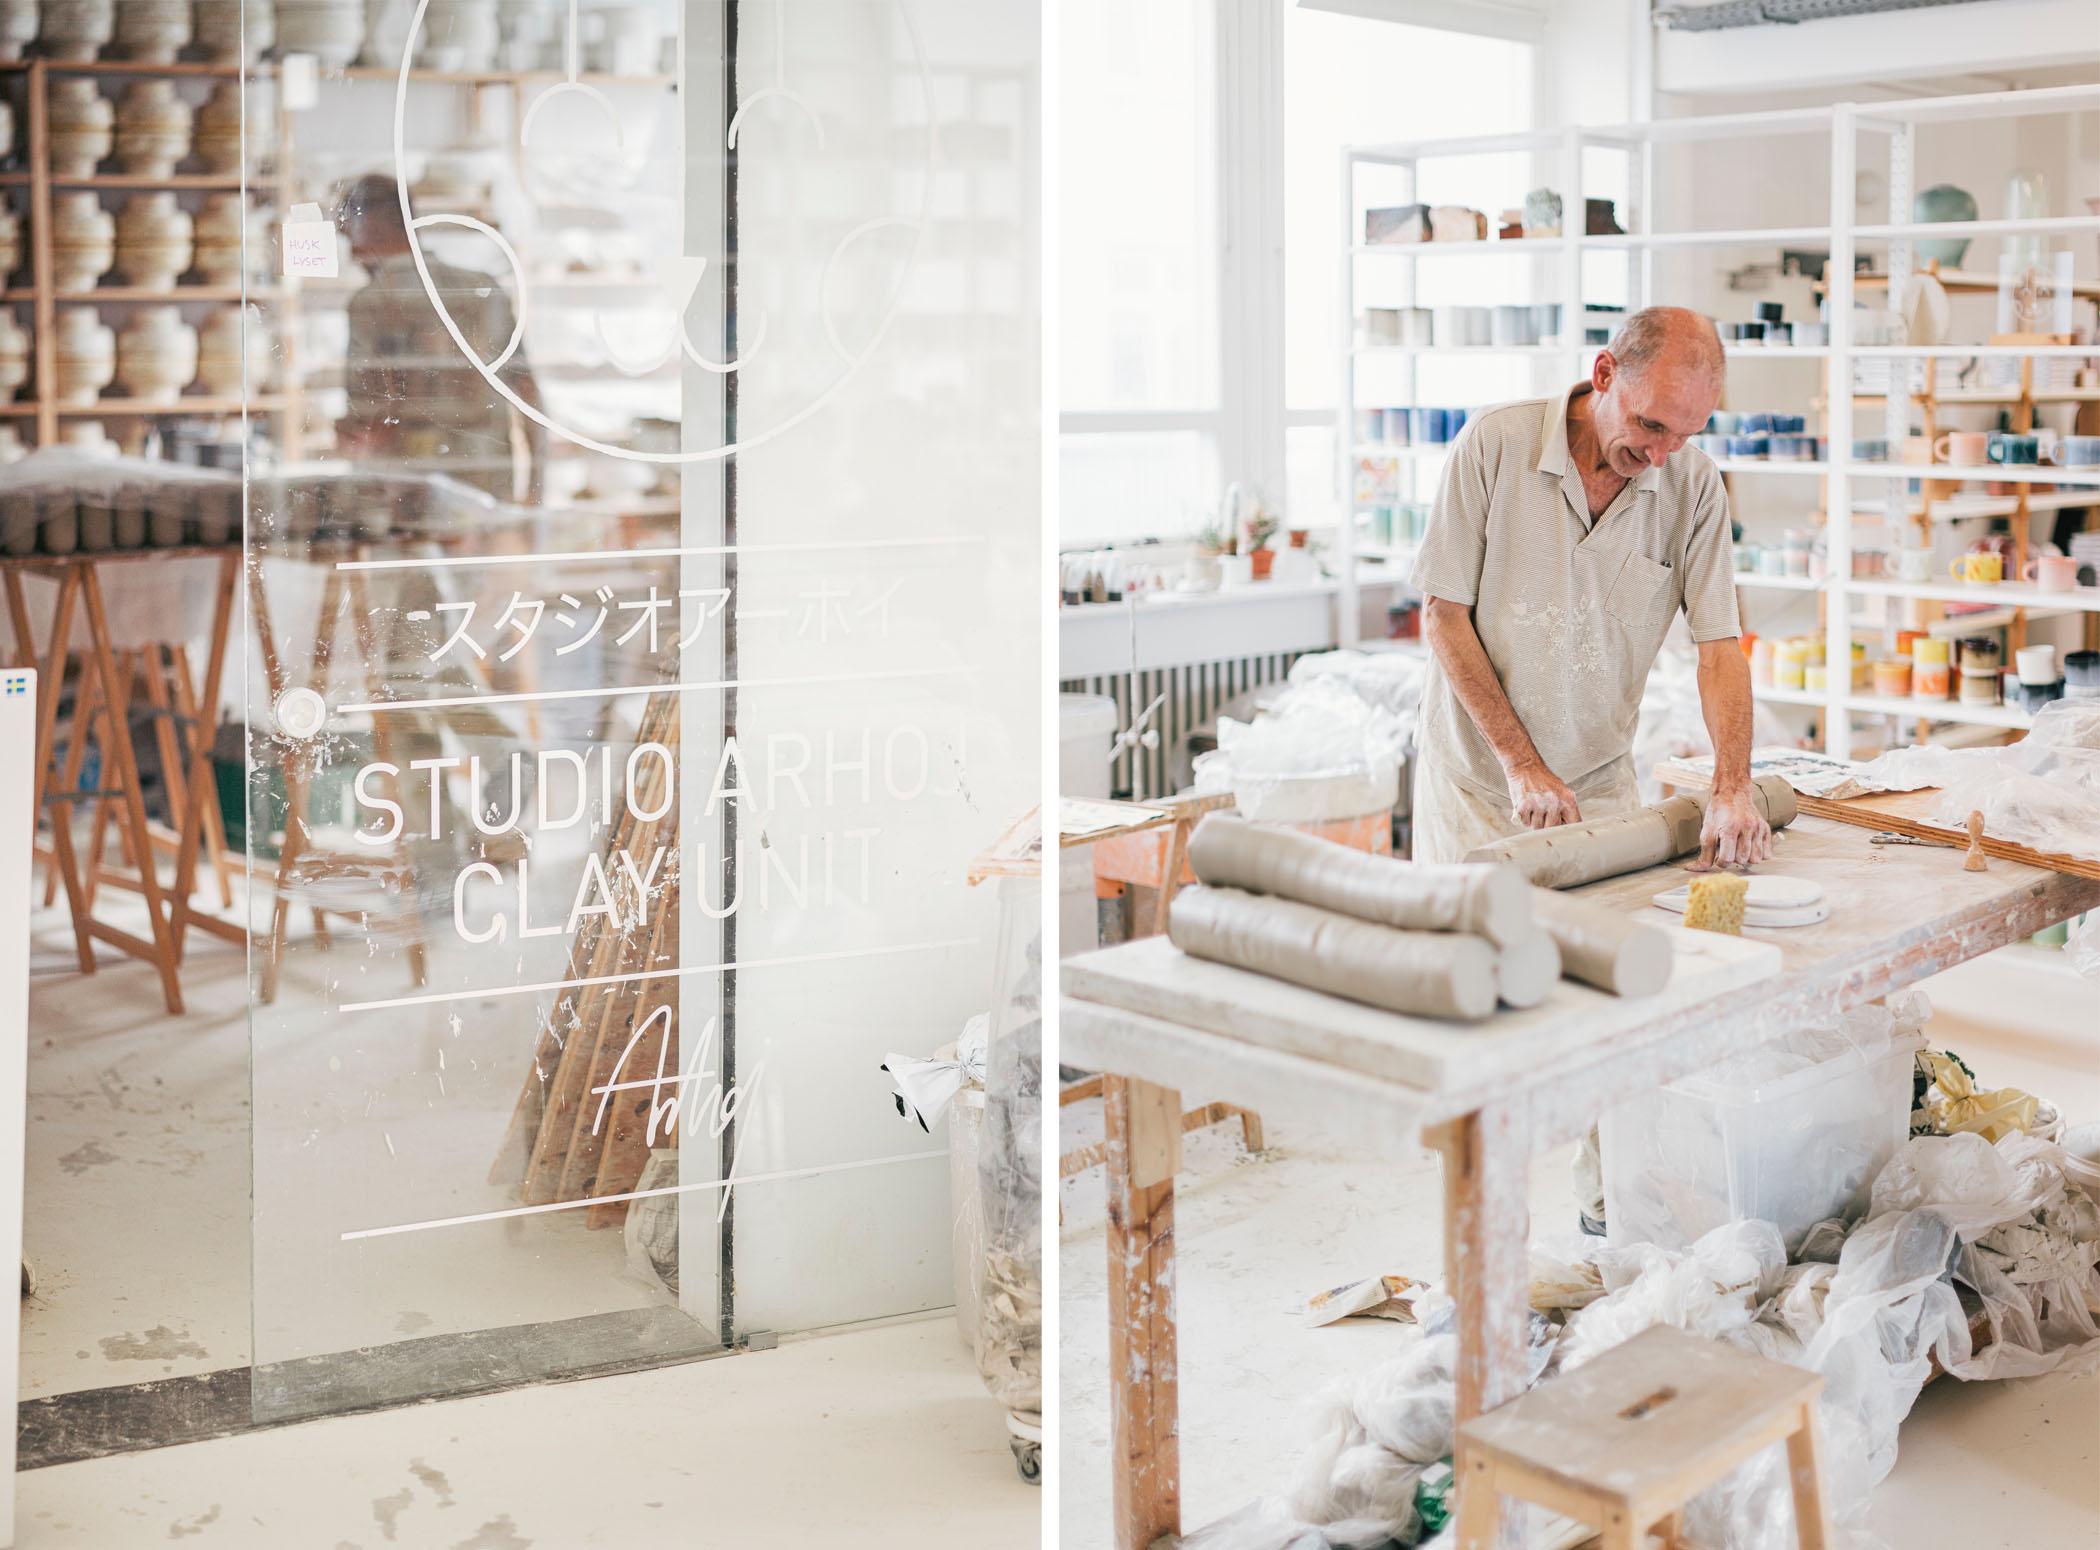 homtastics-Studio-Arhoj-pottery-studio